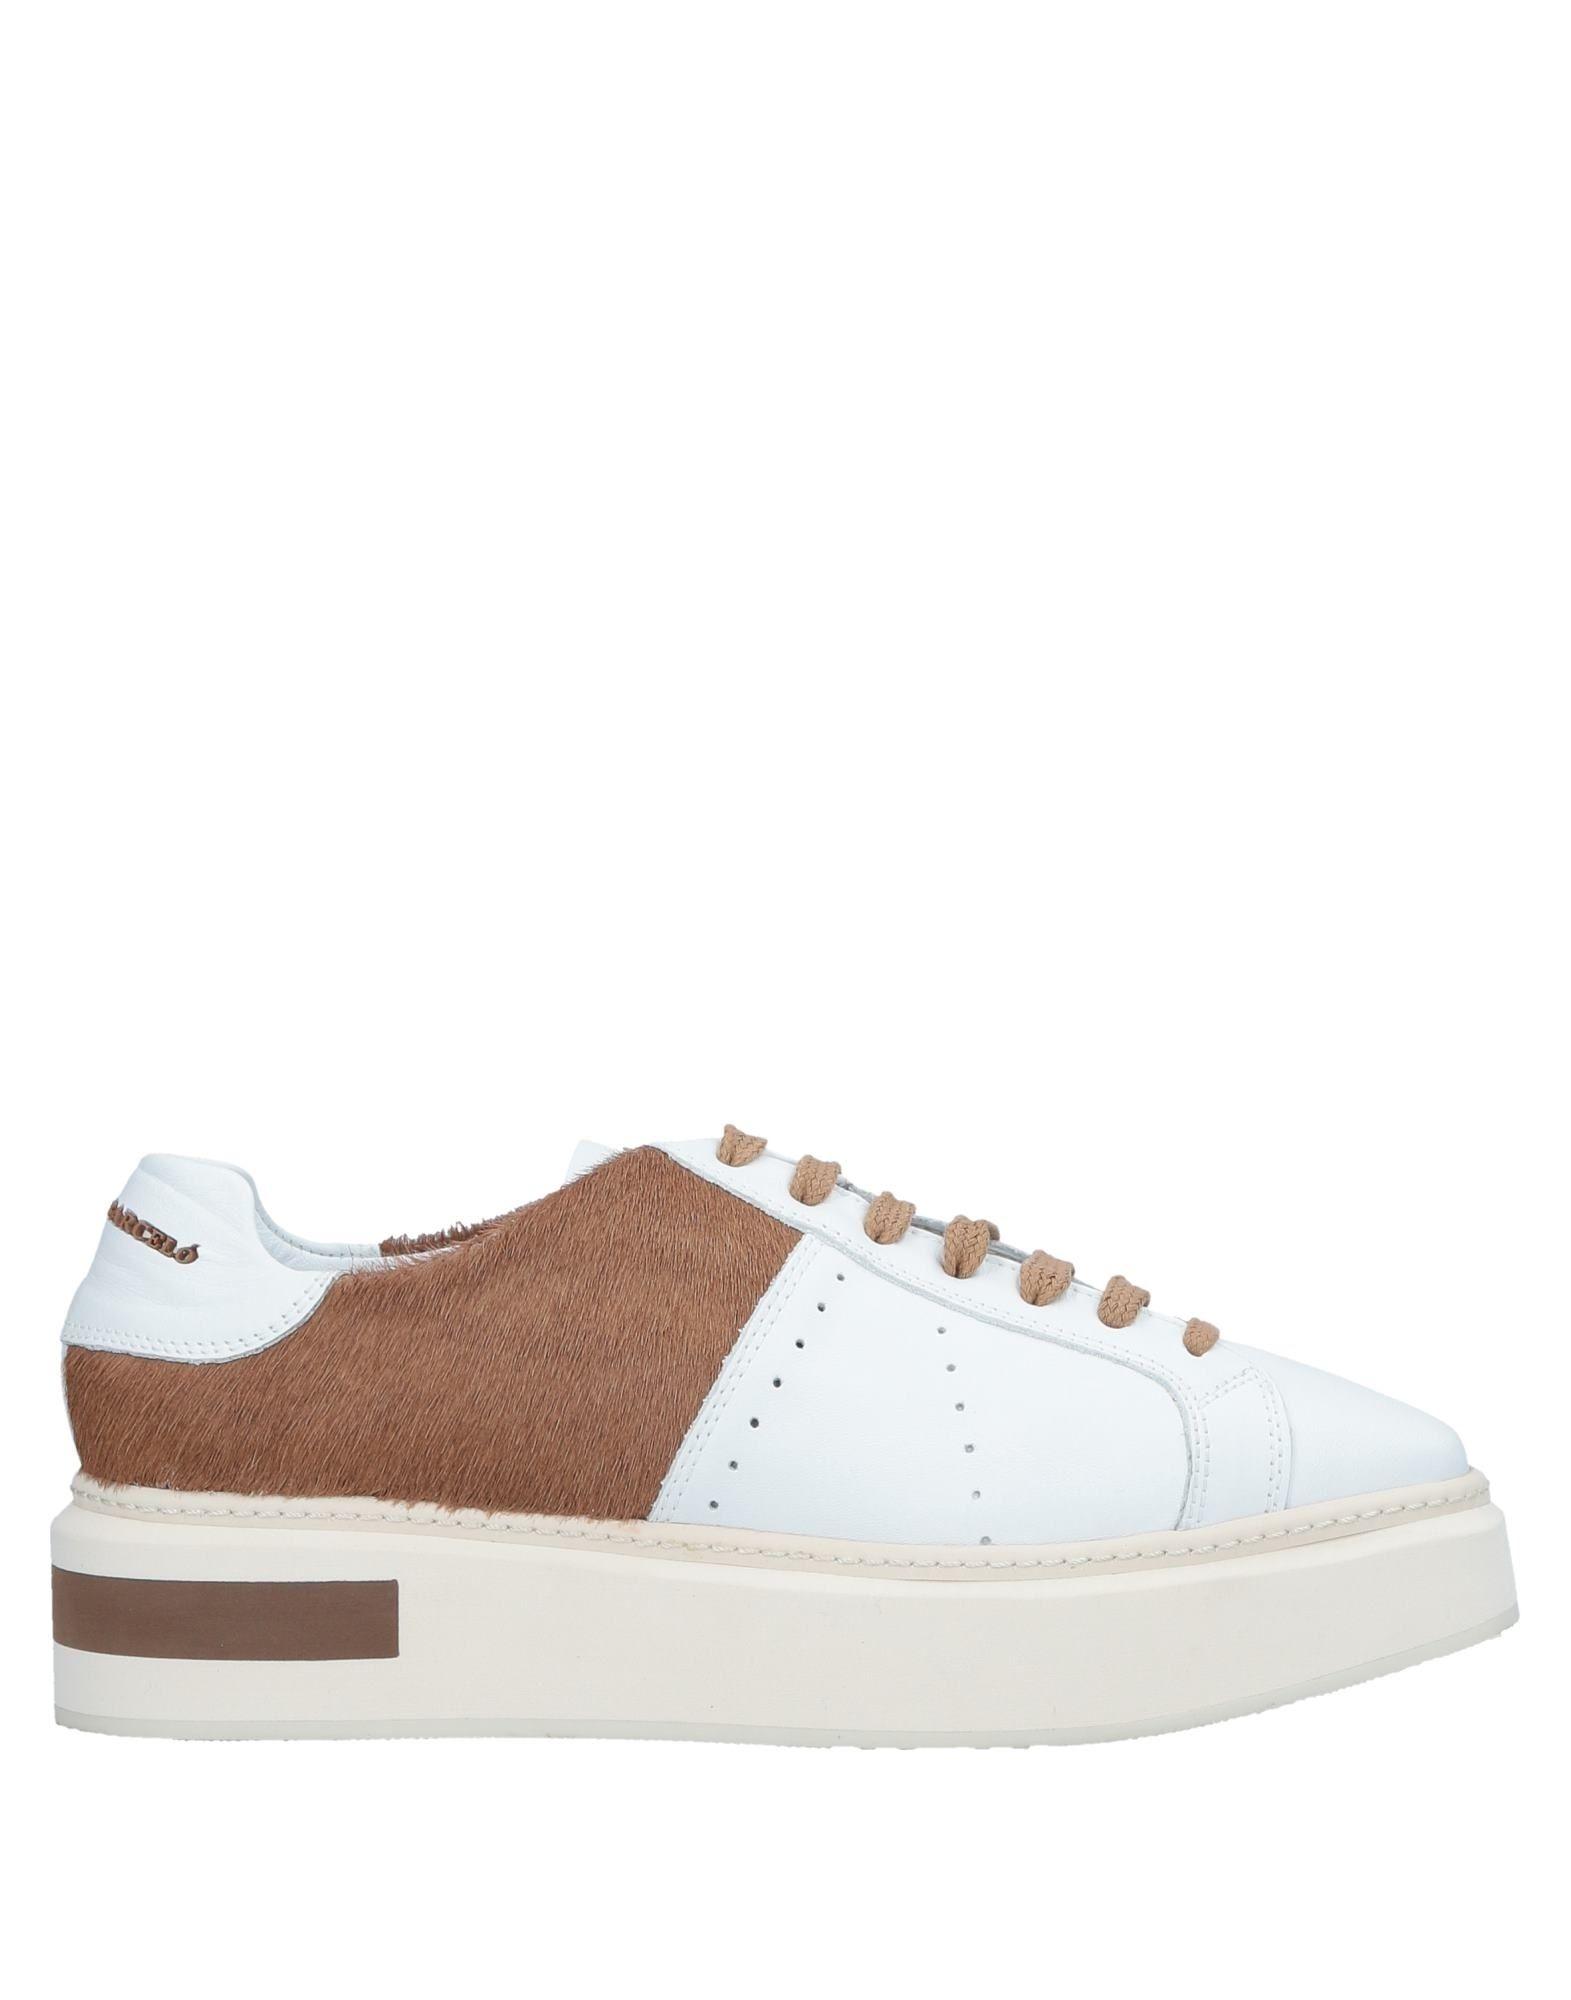 Manuel Barceló Sneakers Damen  11531023KK Neue Schuhe